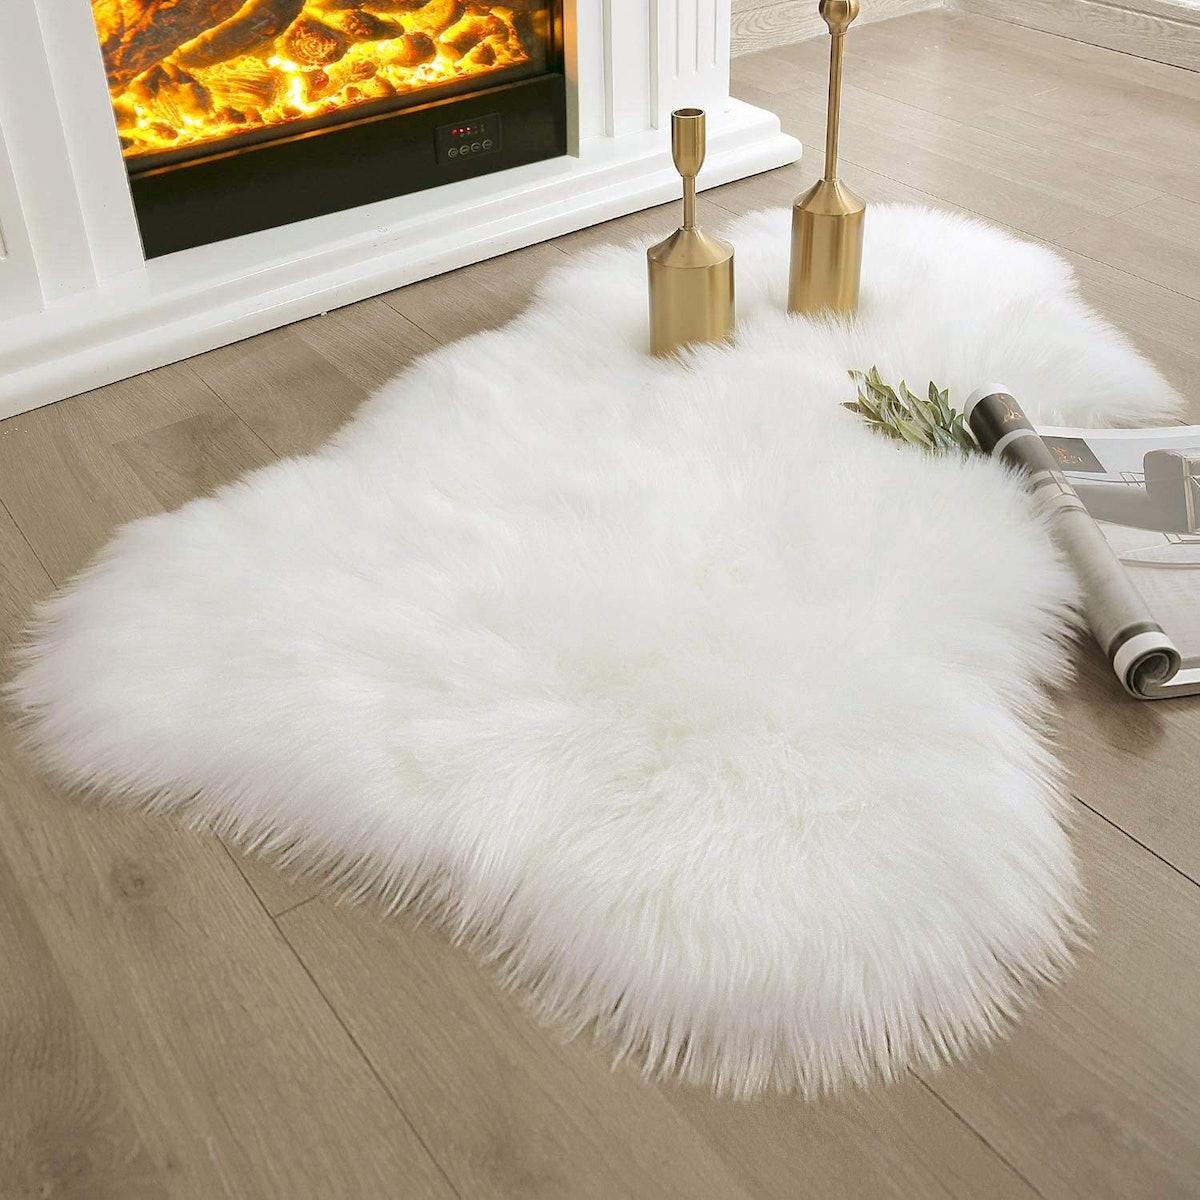 Ashler Home Deco Faux Sheepskin Fur Rug